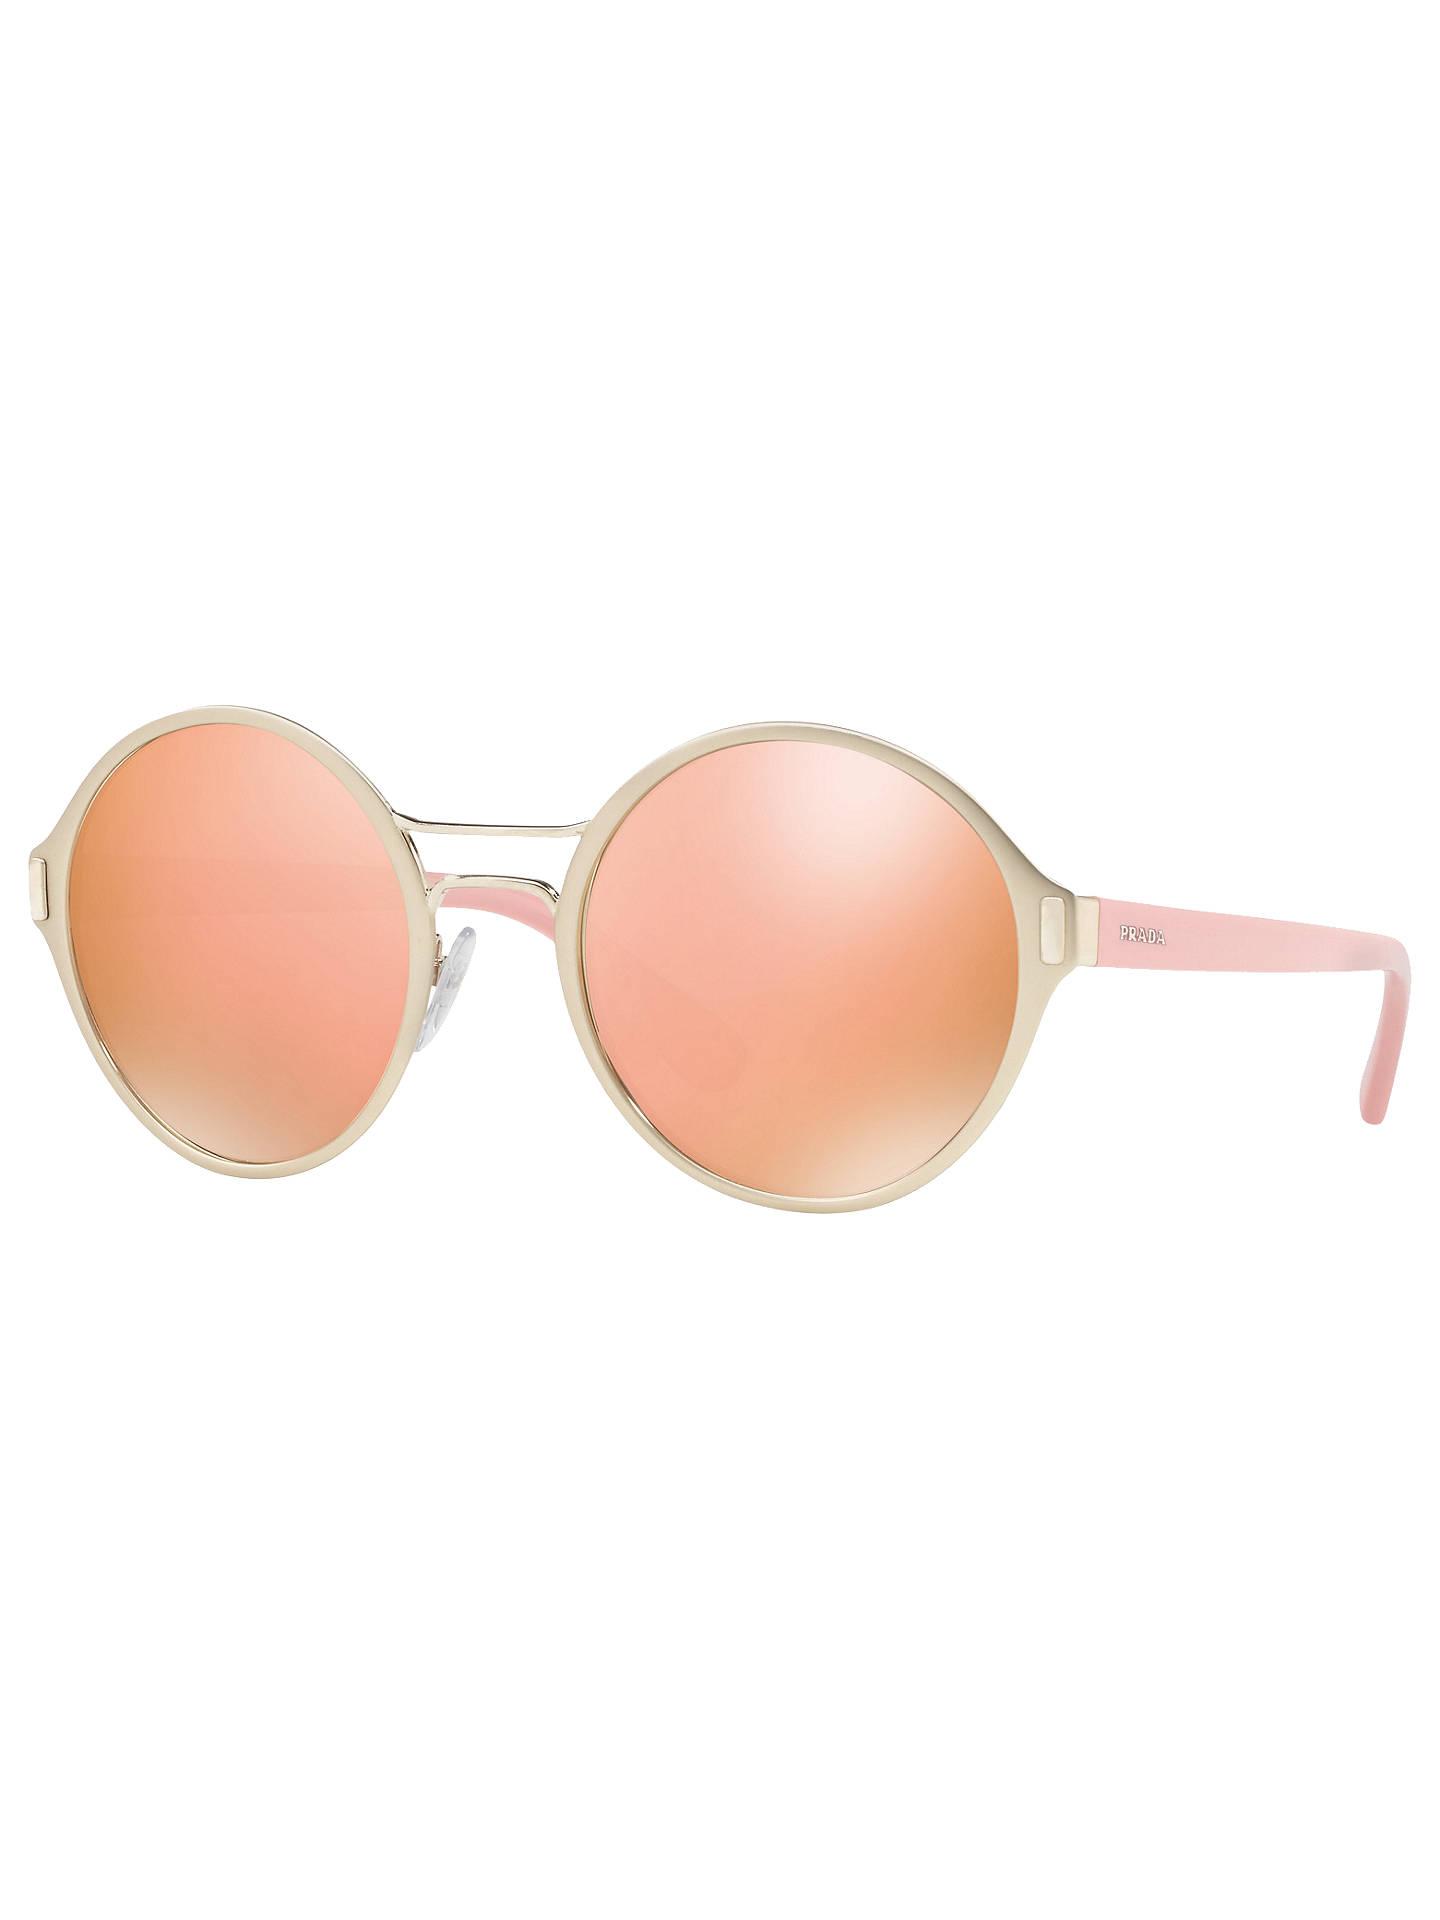 663df5cd05fa2 Buy Prada PR 57TS Round Sunglasses